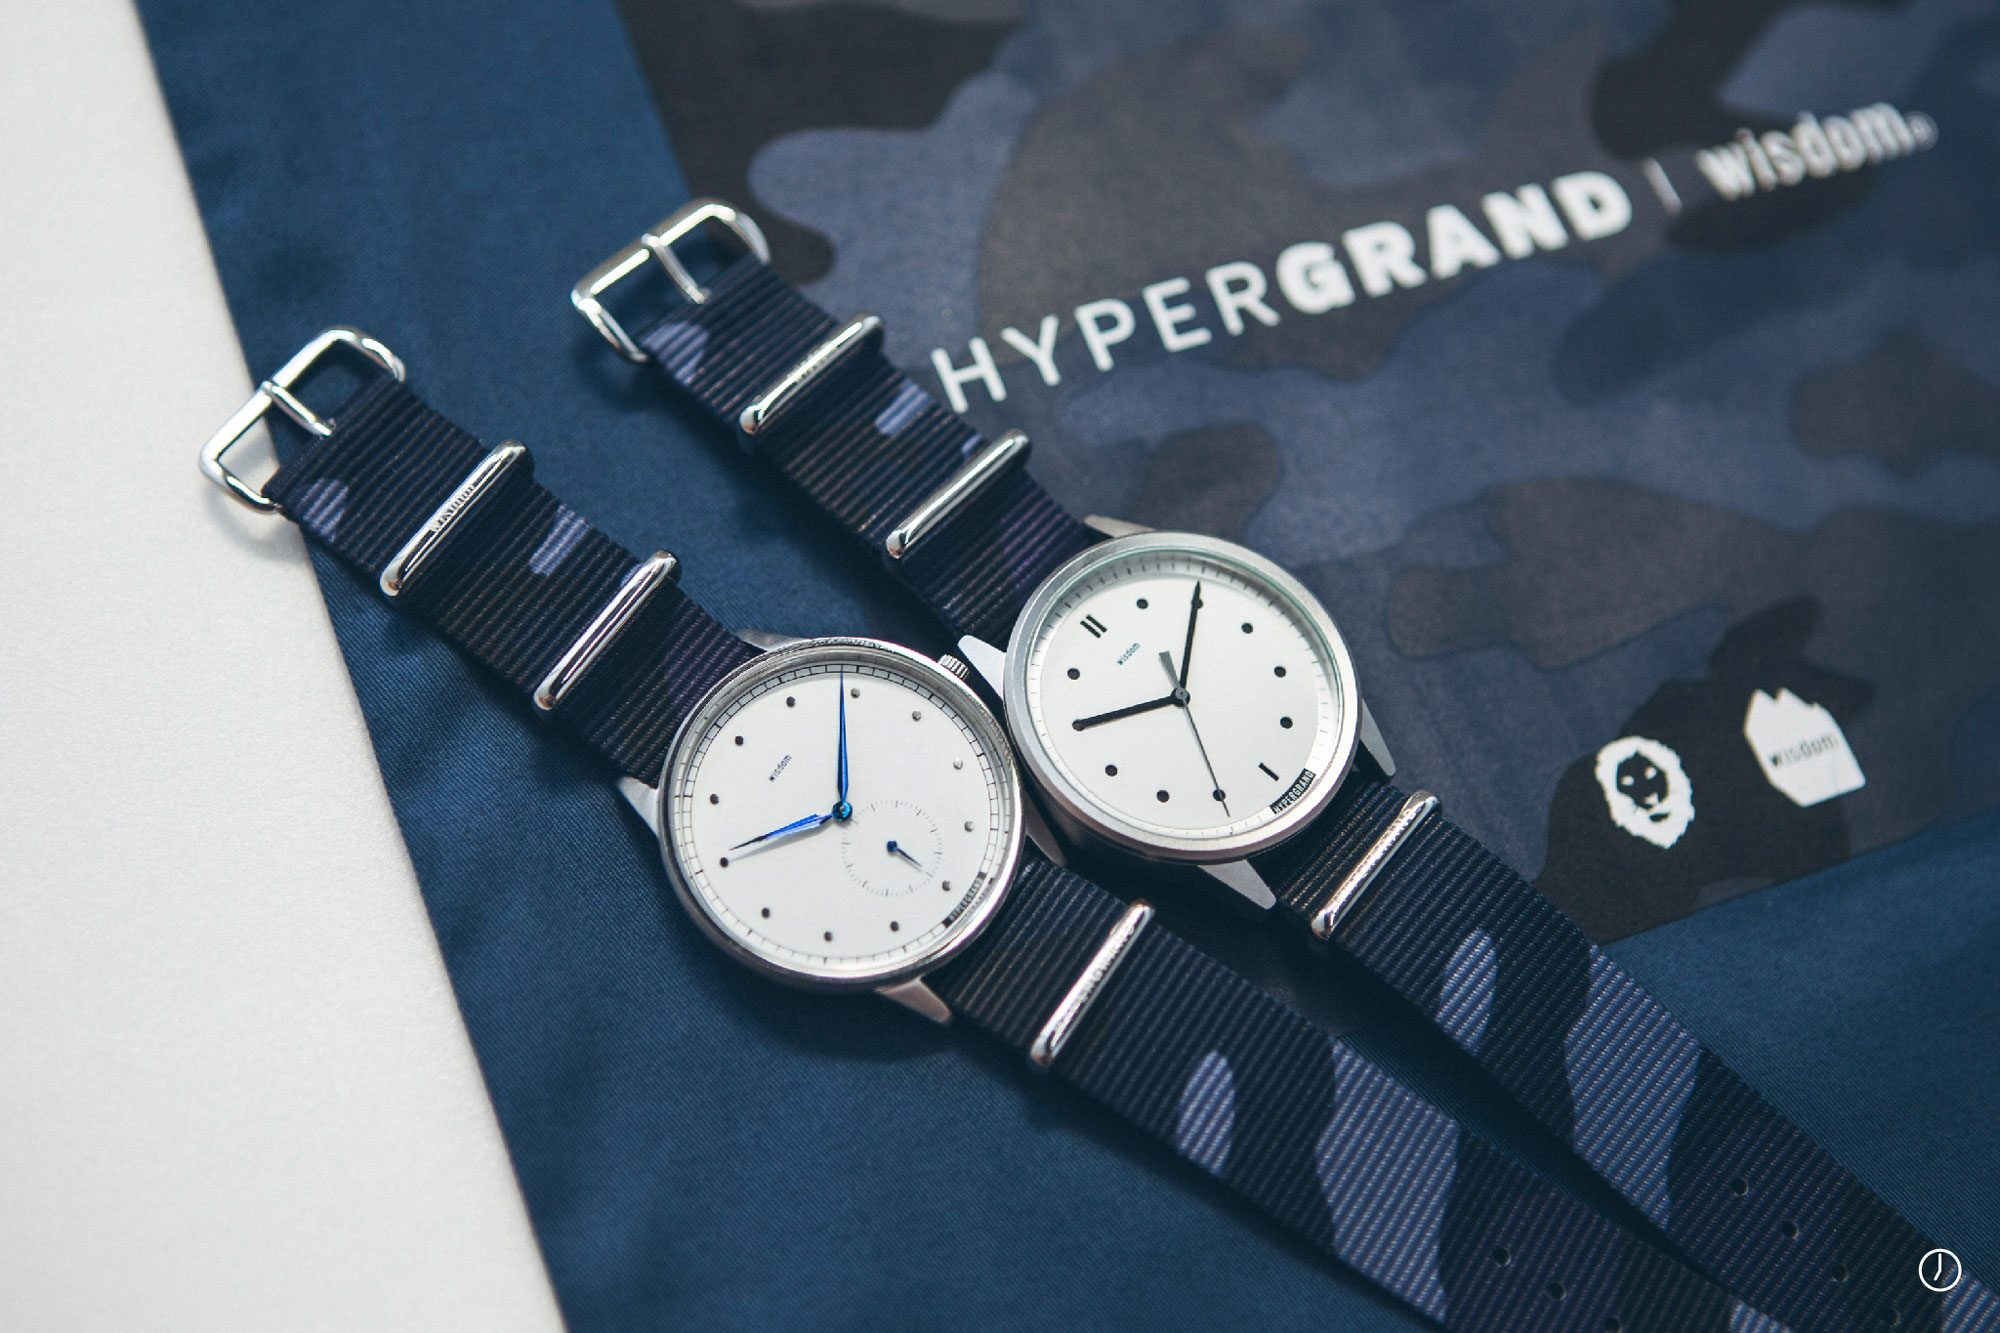 wisdom-x-hypergrand-collaboration-watch-lookbook-06